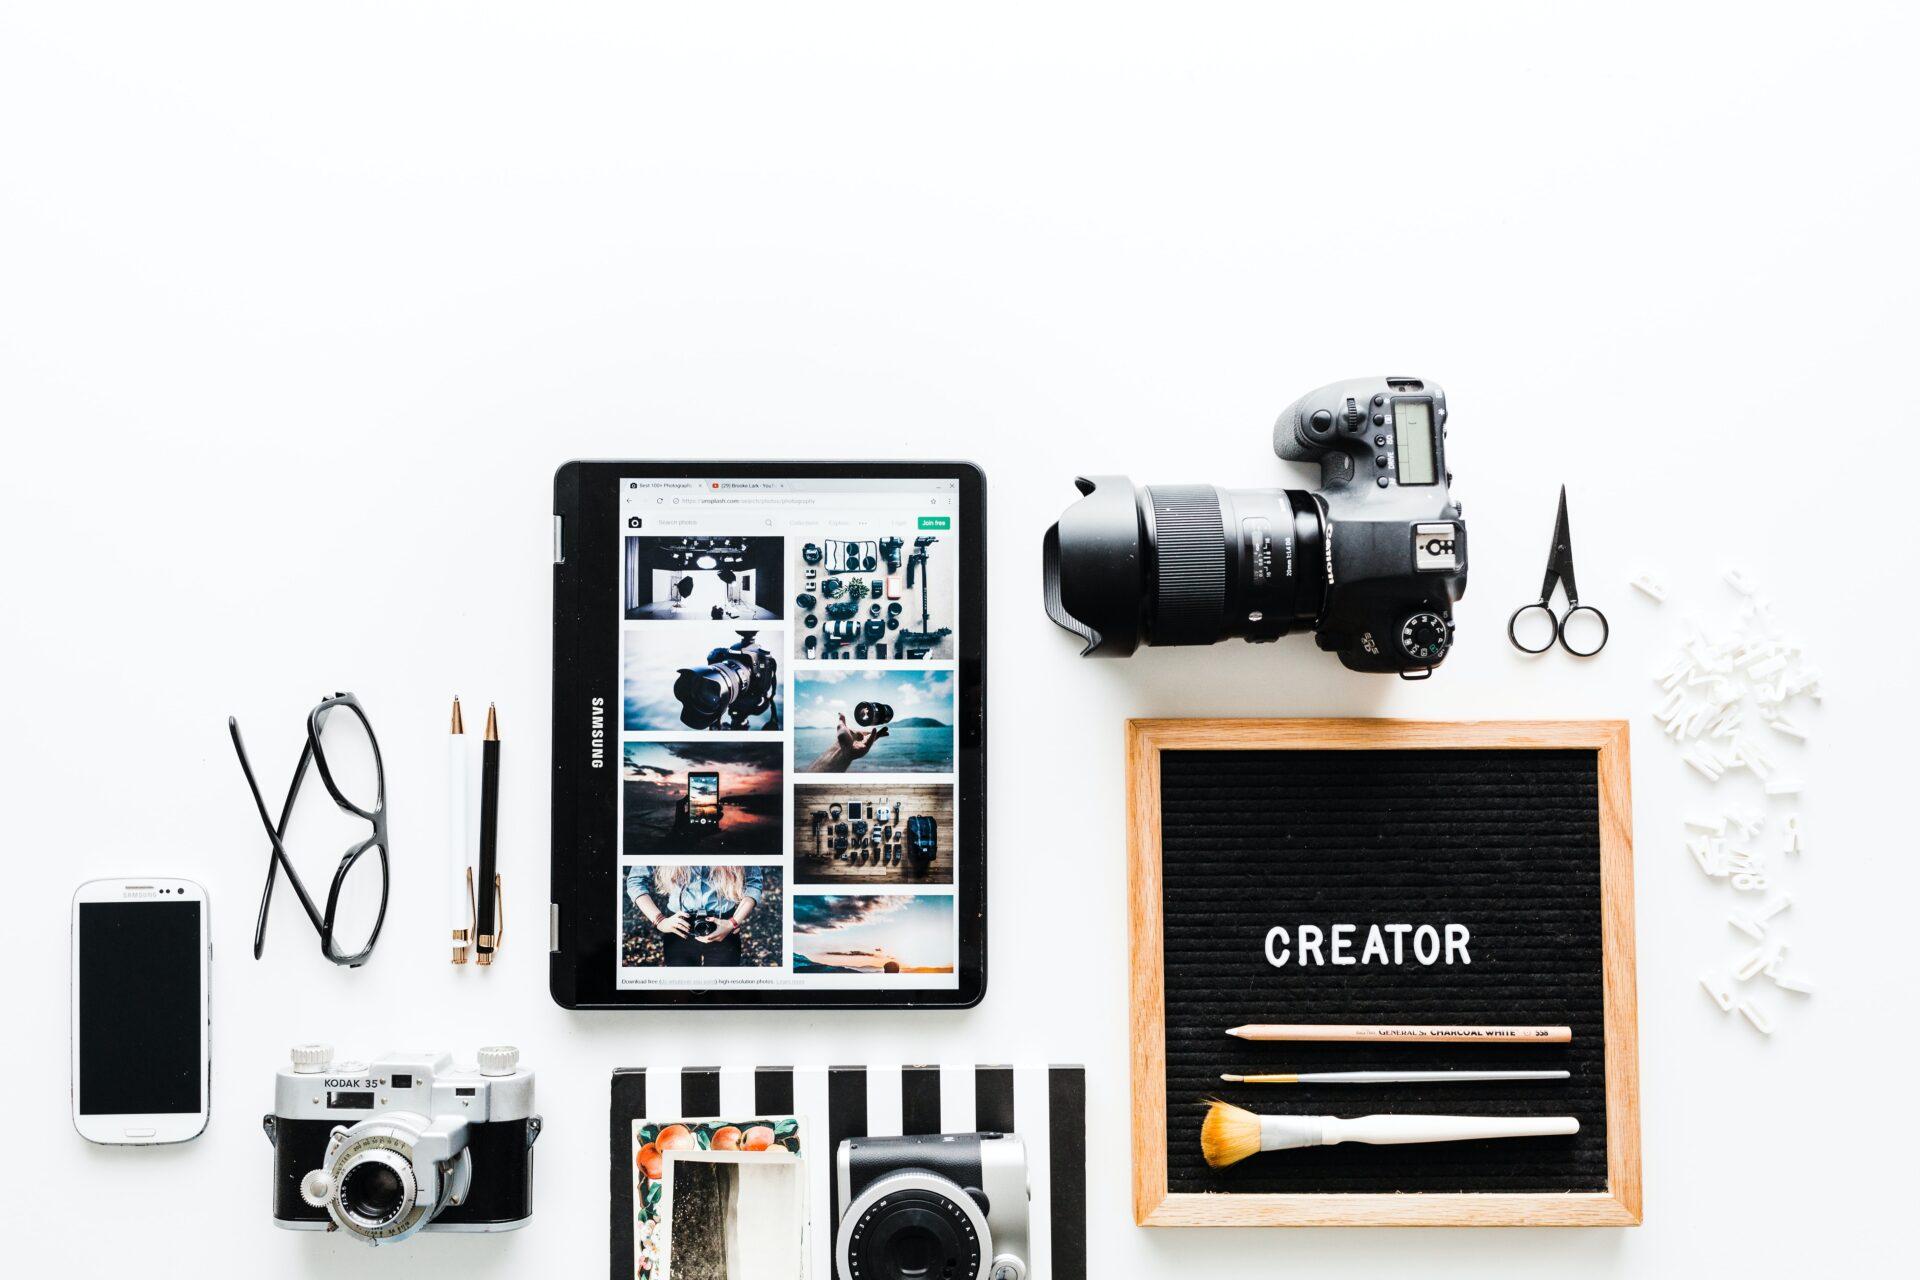 Creating Awesome Content - Evoke International Marketing, PR, Design, Strat Comms Dubai